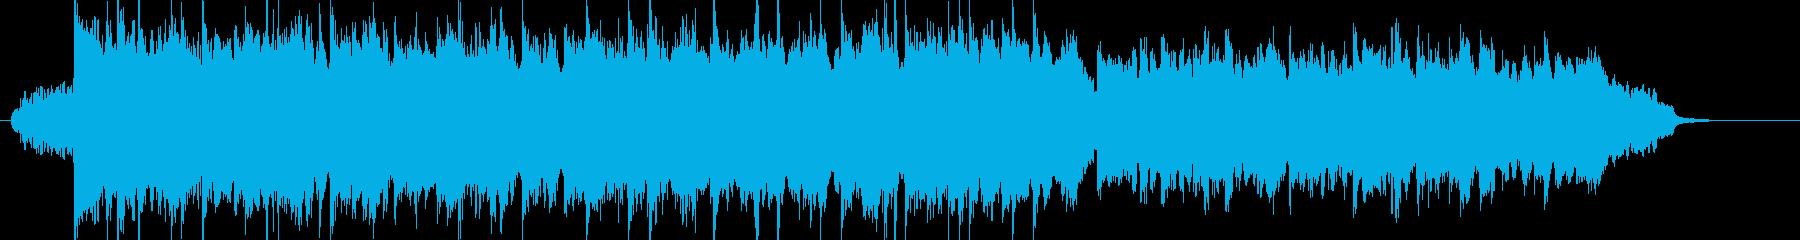 Calm Orchestra 1の再生済みの波形